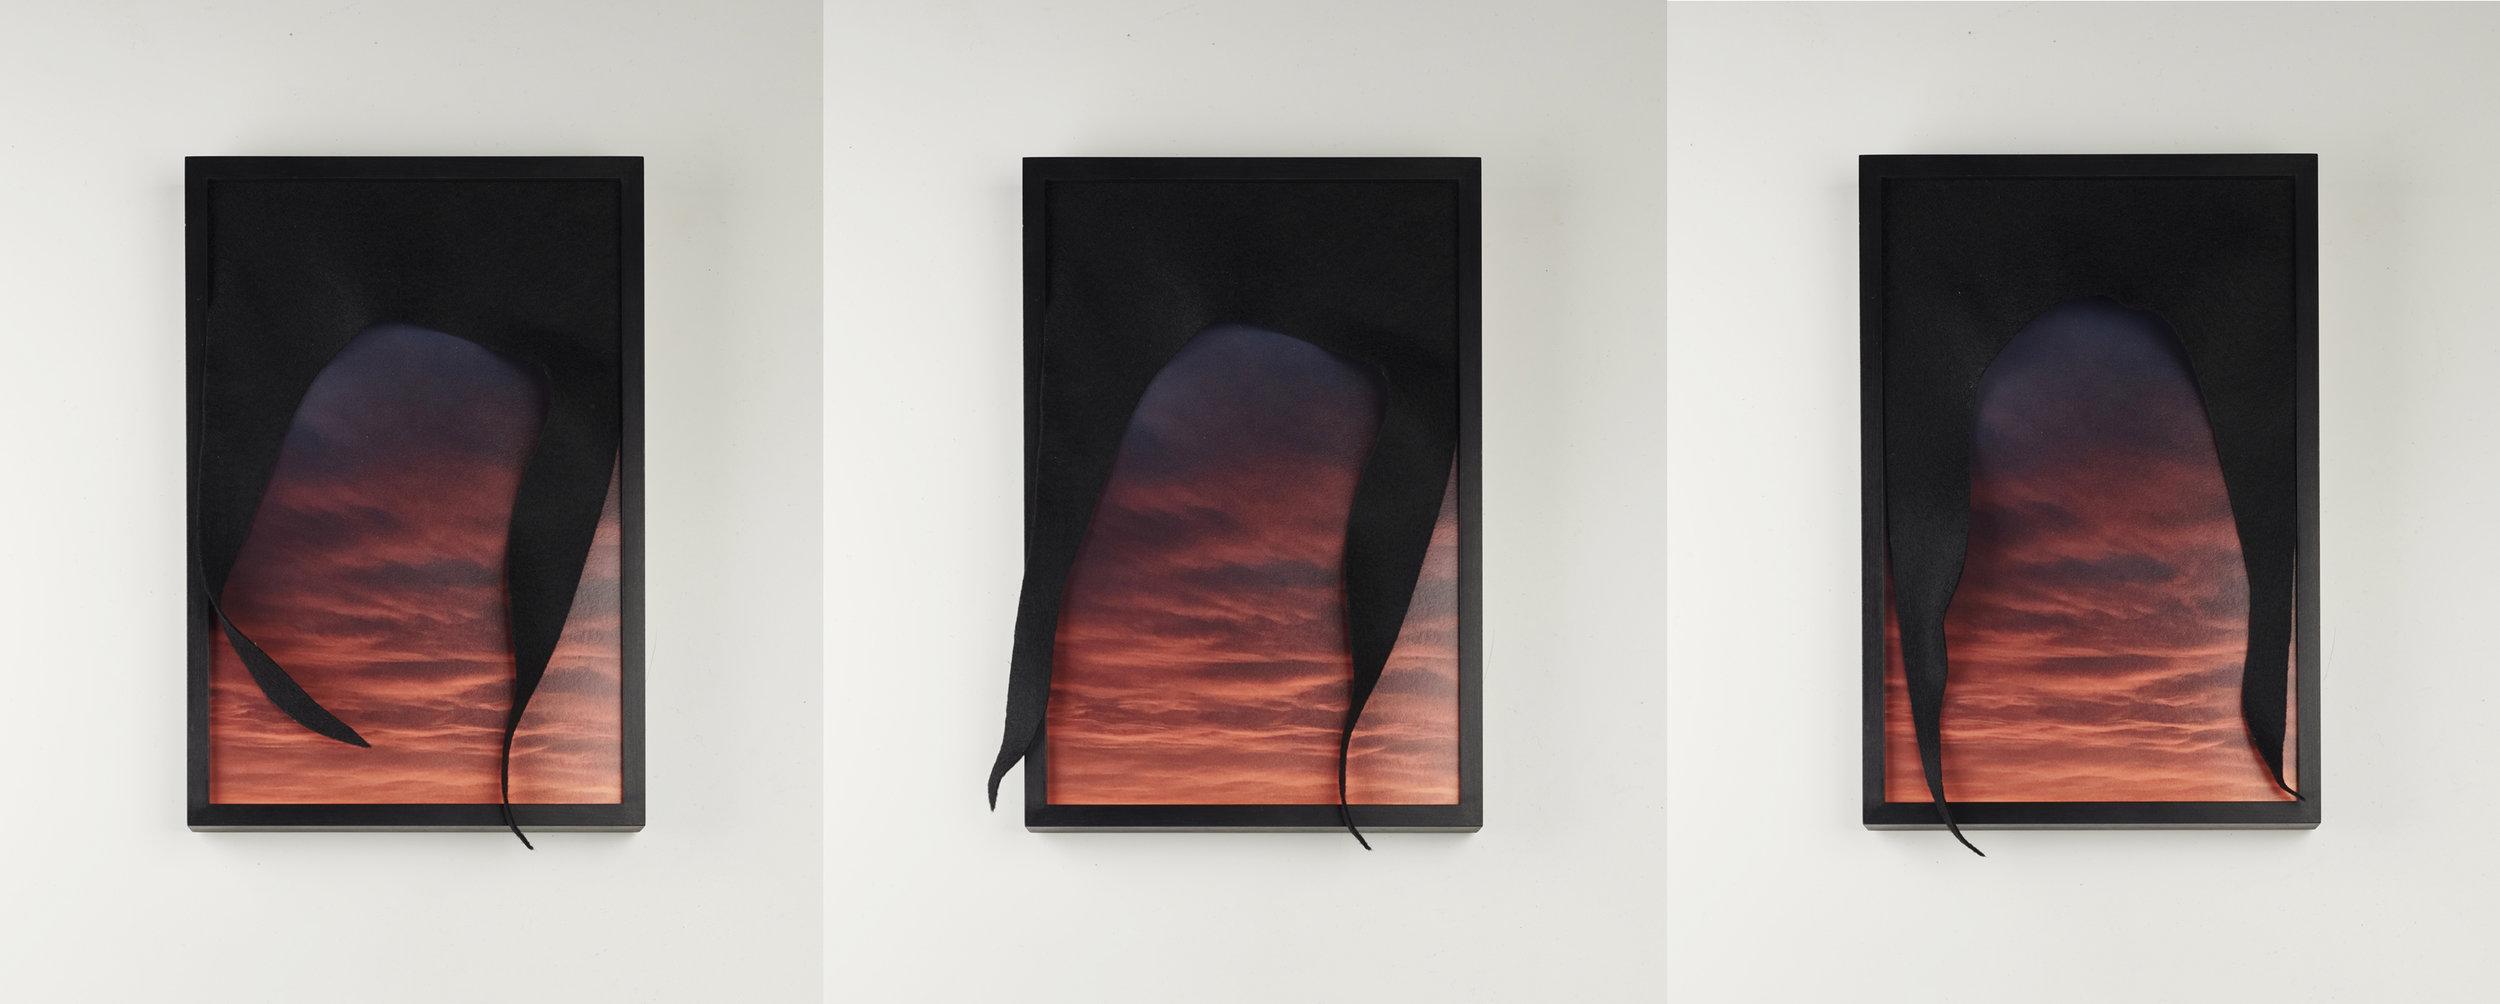 Untitled, Drape No.4  Triptych  2019